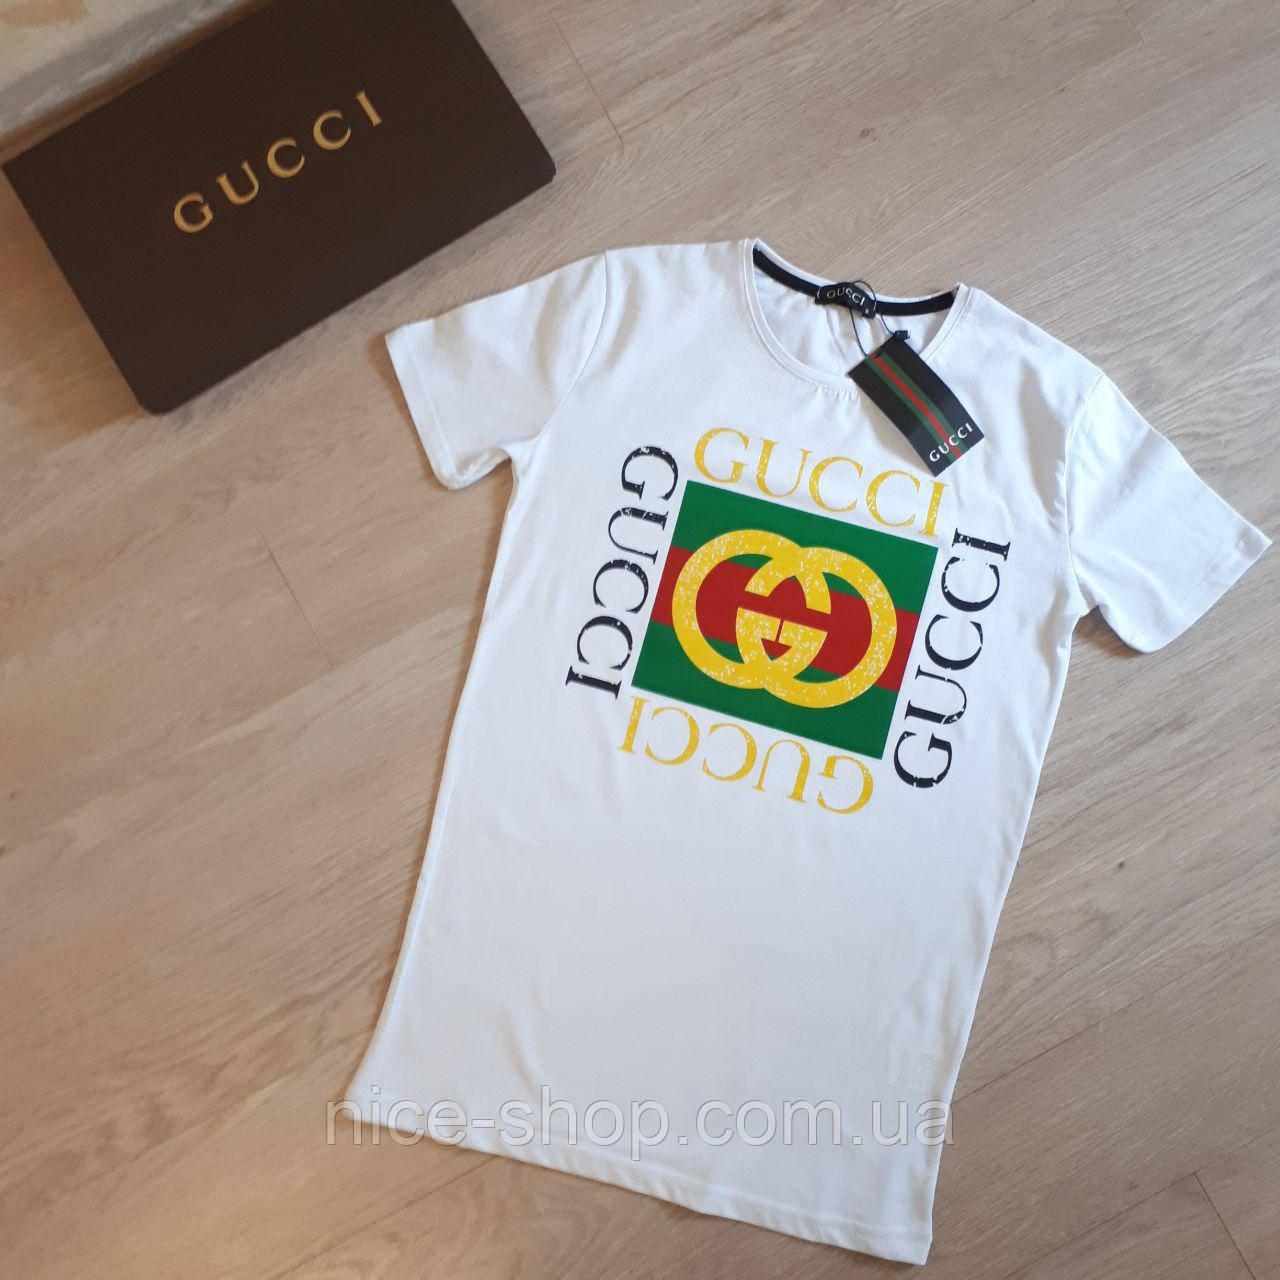 Футболка Gucci мужская белая с логотипом XL